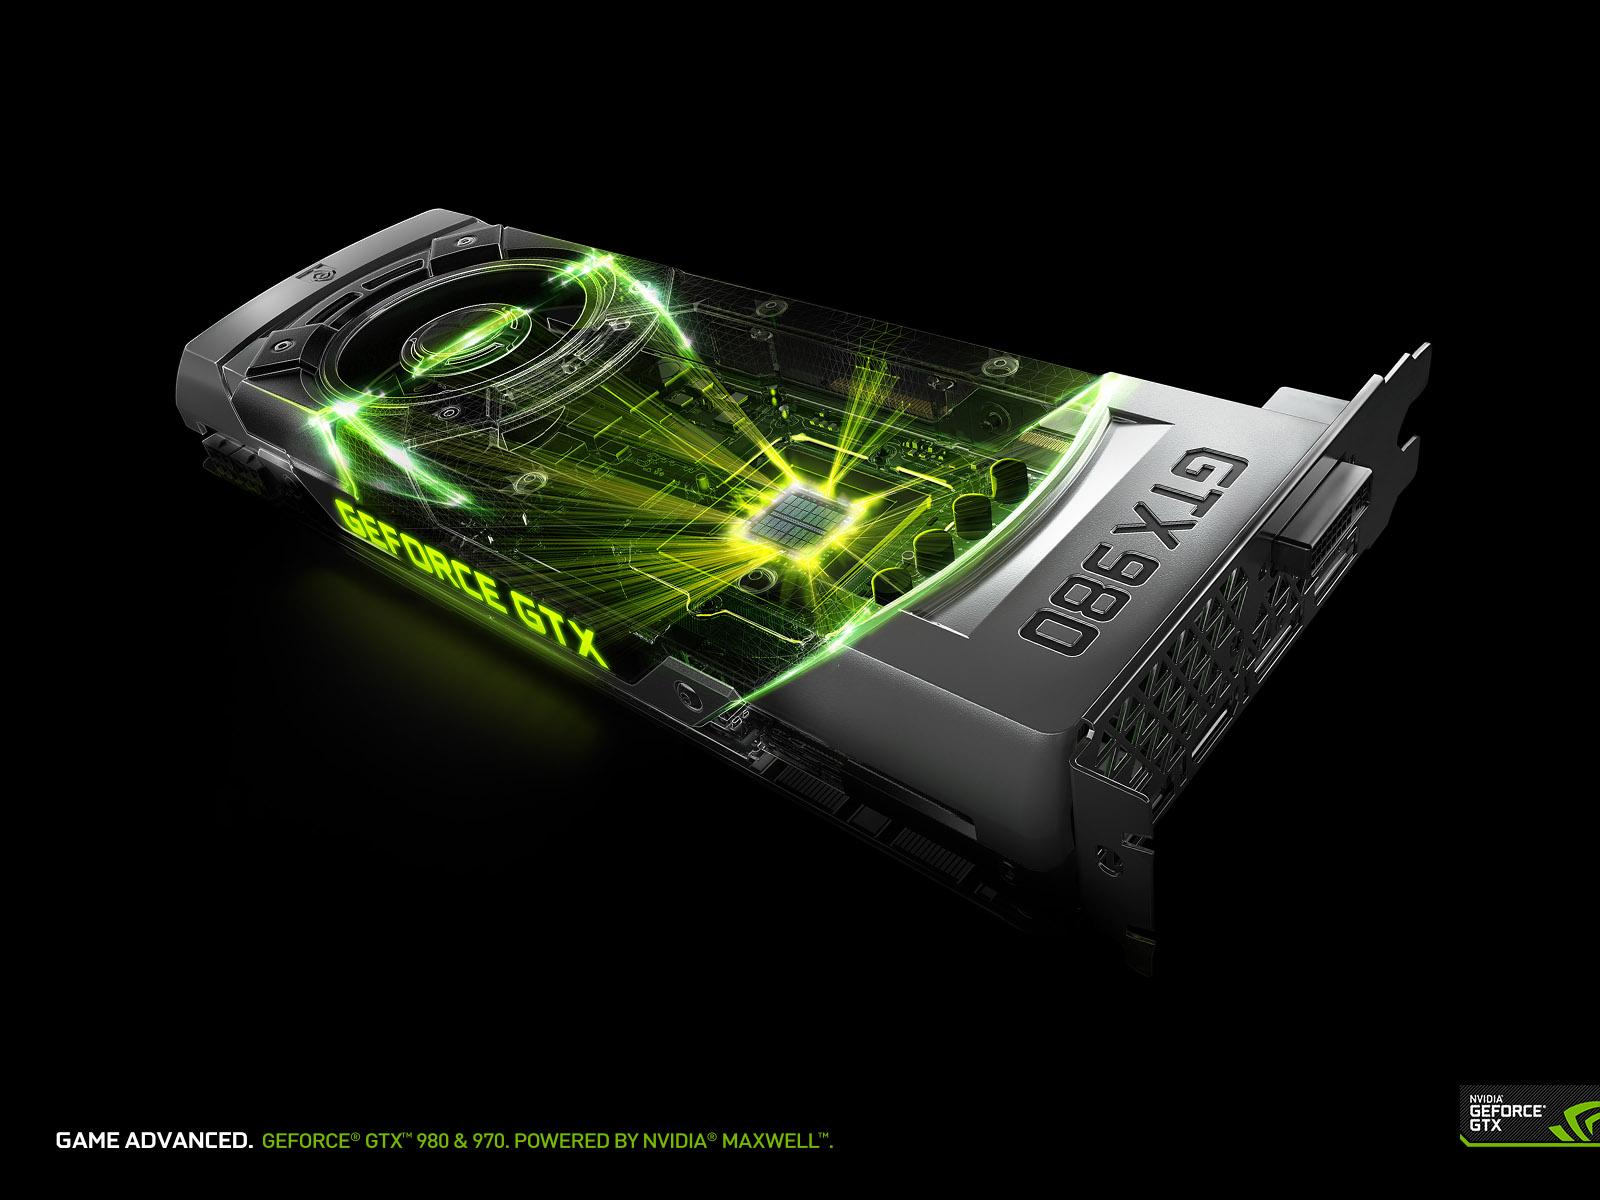 Wallpaper Minecraft 3d 颠峰至尊 快来下载最酷,最炫的 Geforce Gtx 980 Amp 970 壁纸 Geforce